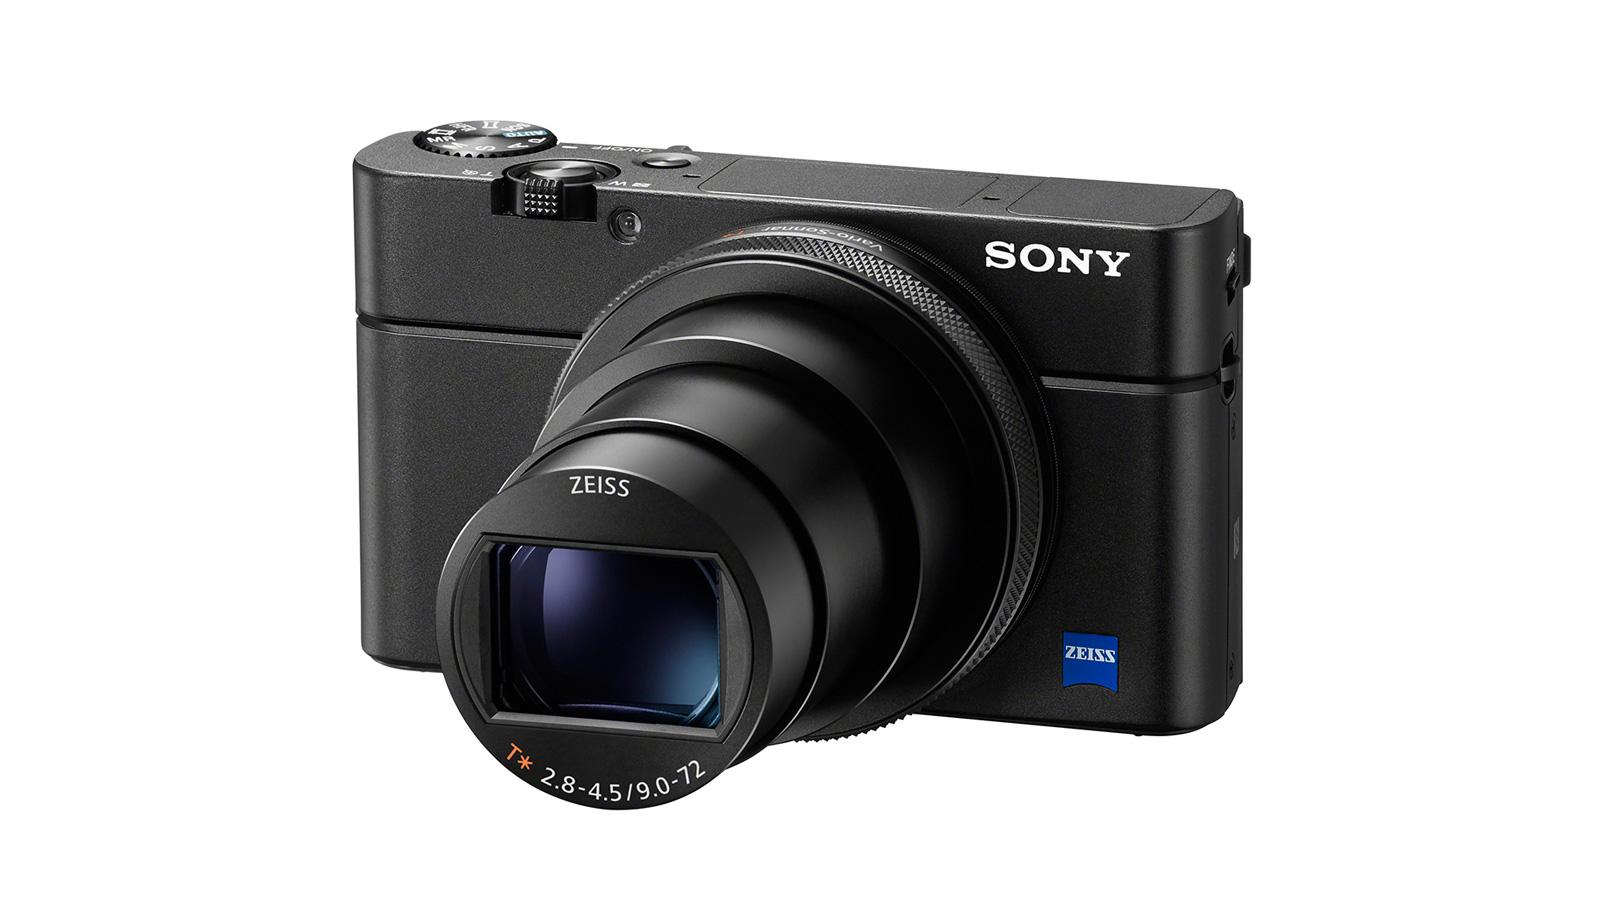 Sony's RX100 Mark VI Has A 24-200mm Lens